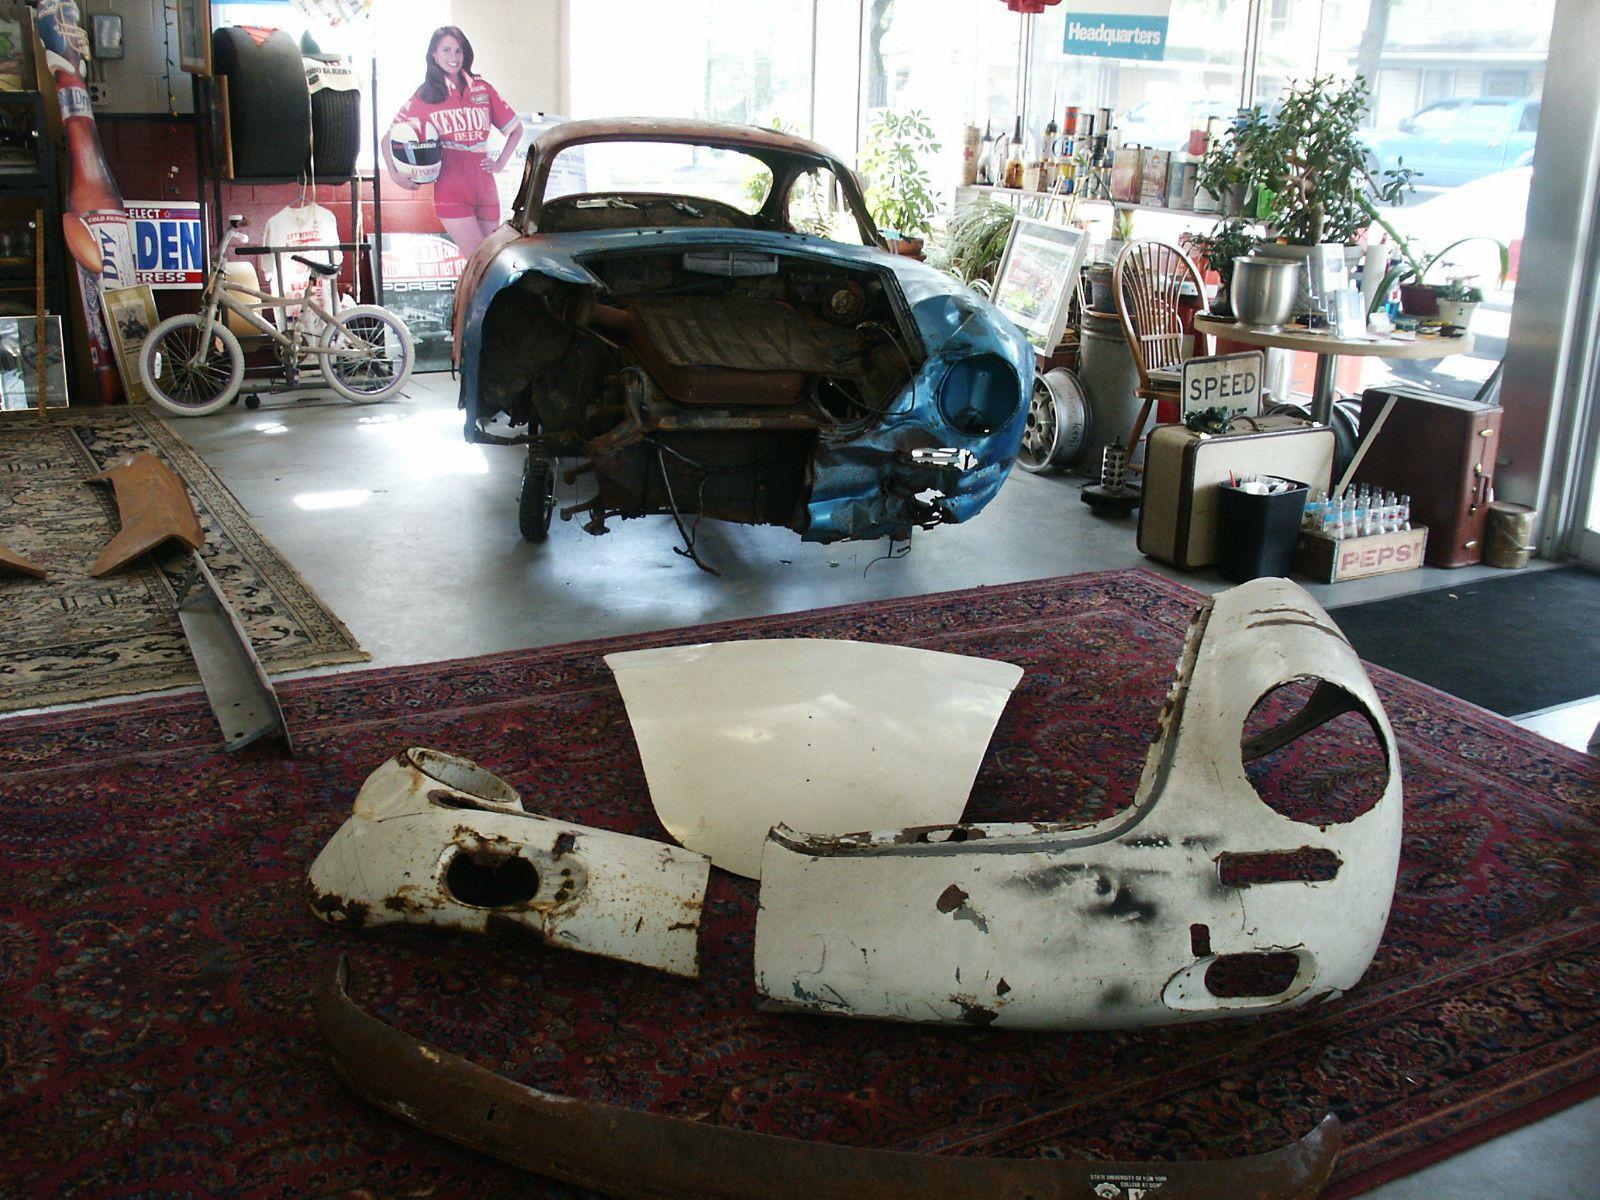 1963 Porsche 356 B T6 Coupe Restoration Project | Project cars for ...